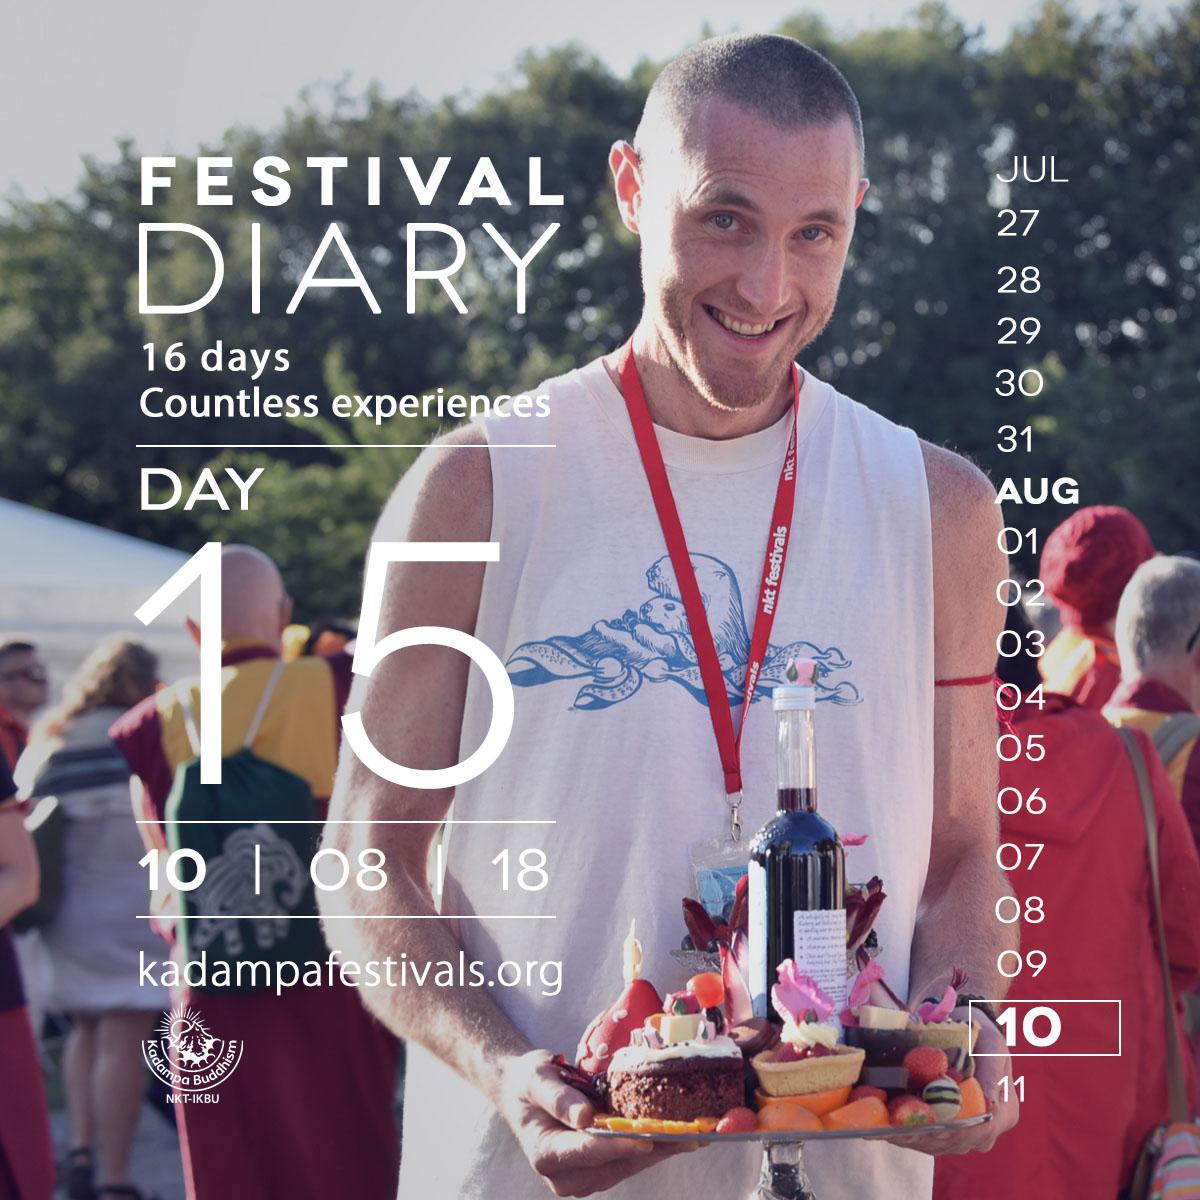 2018-07-26-festival diary-15-m